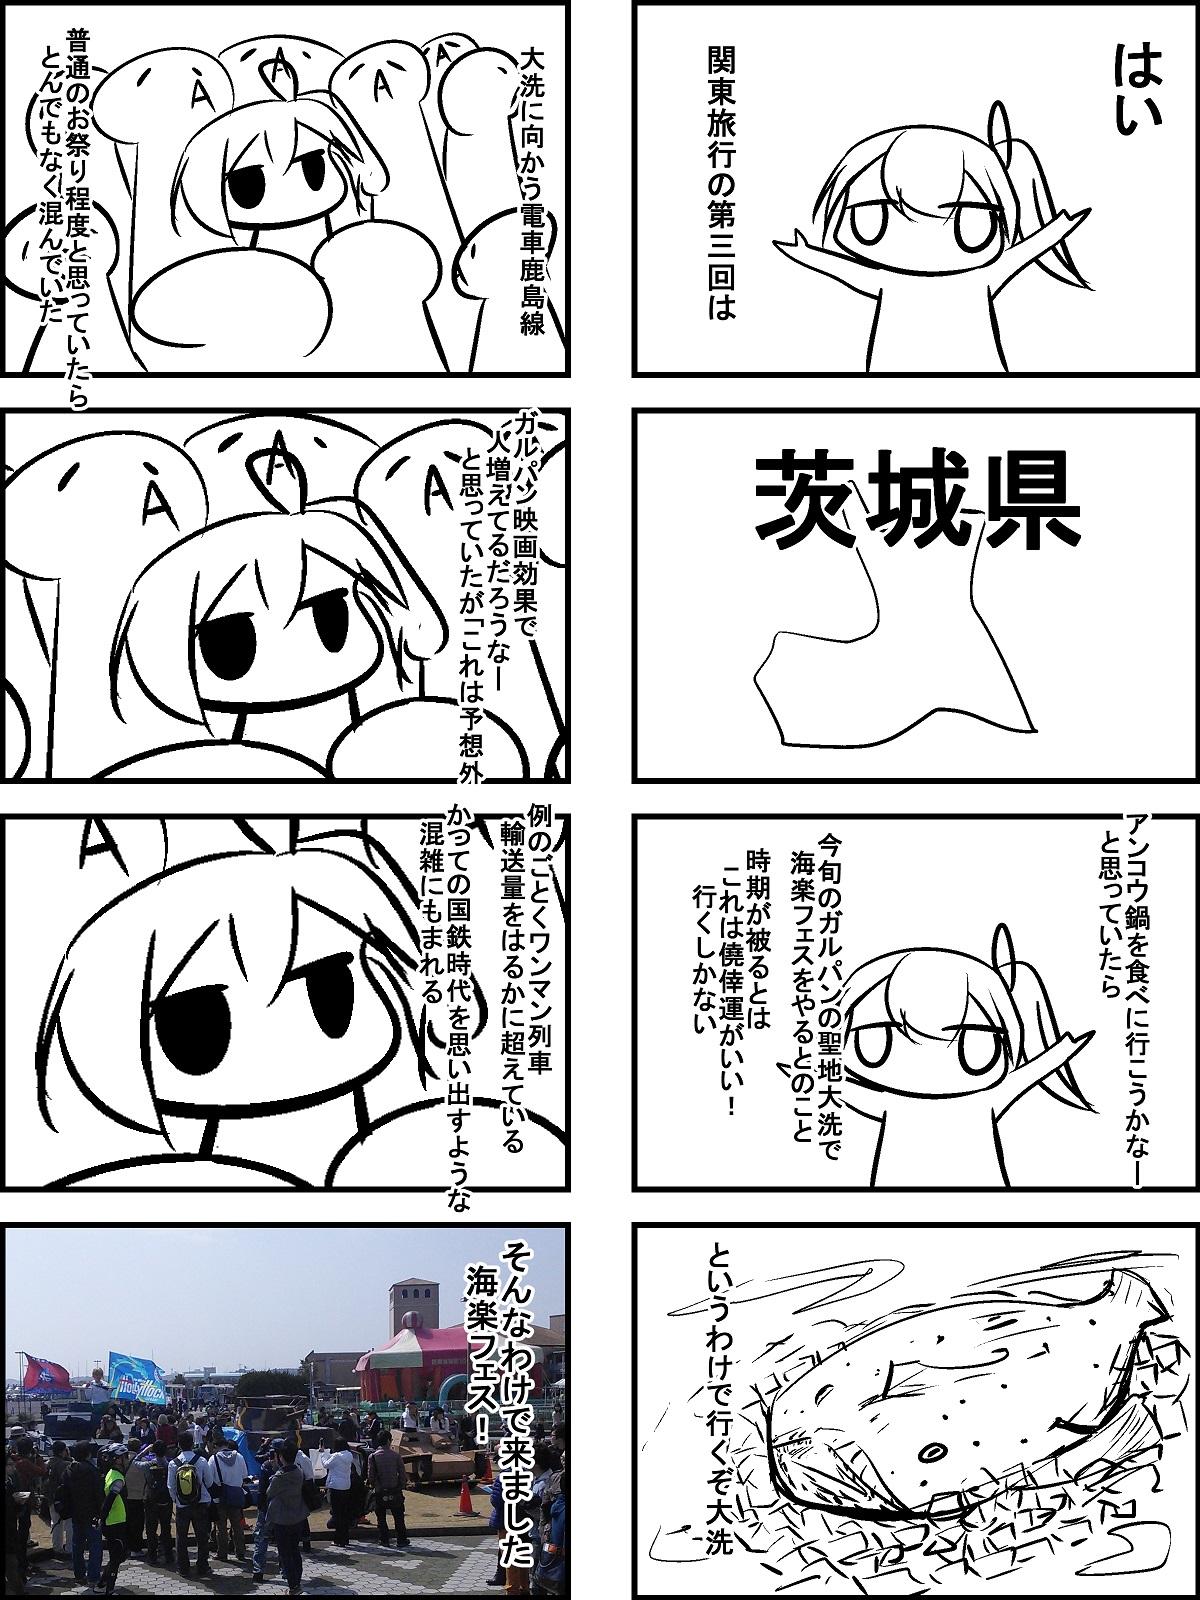 blog-2016320a.jpg